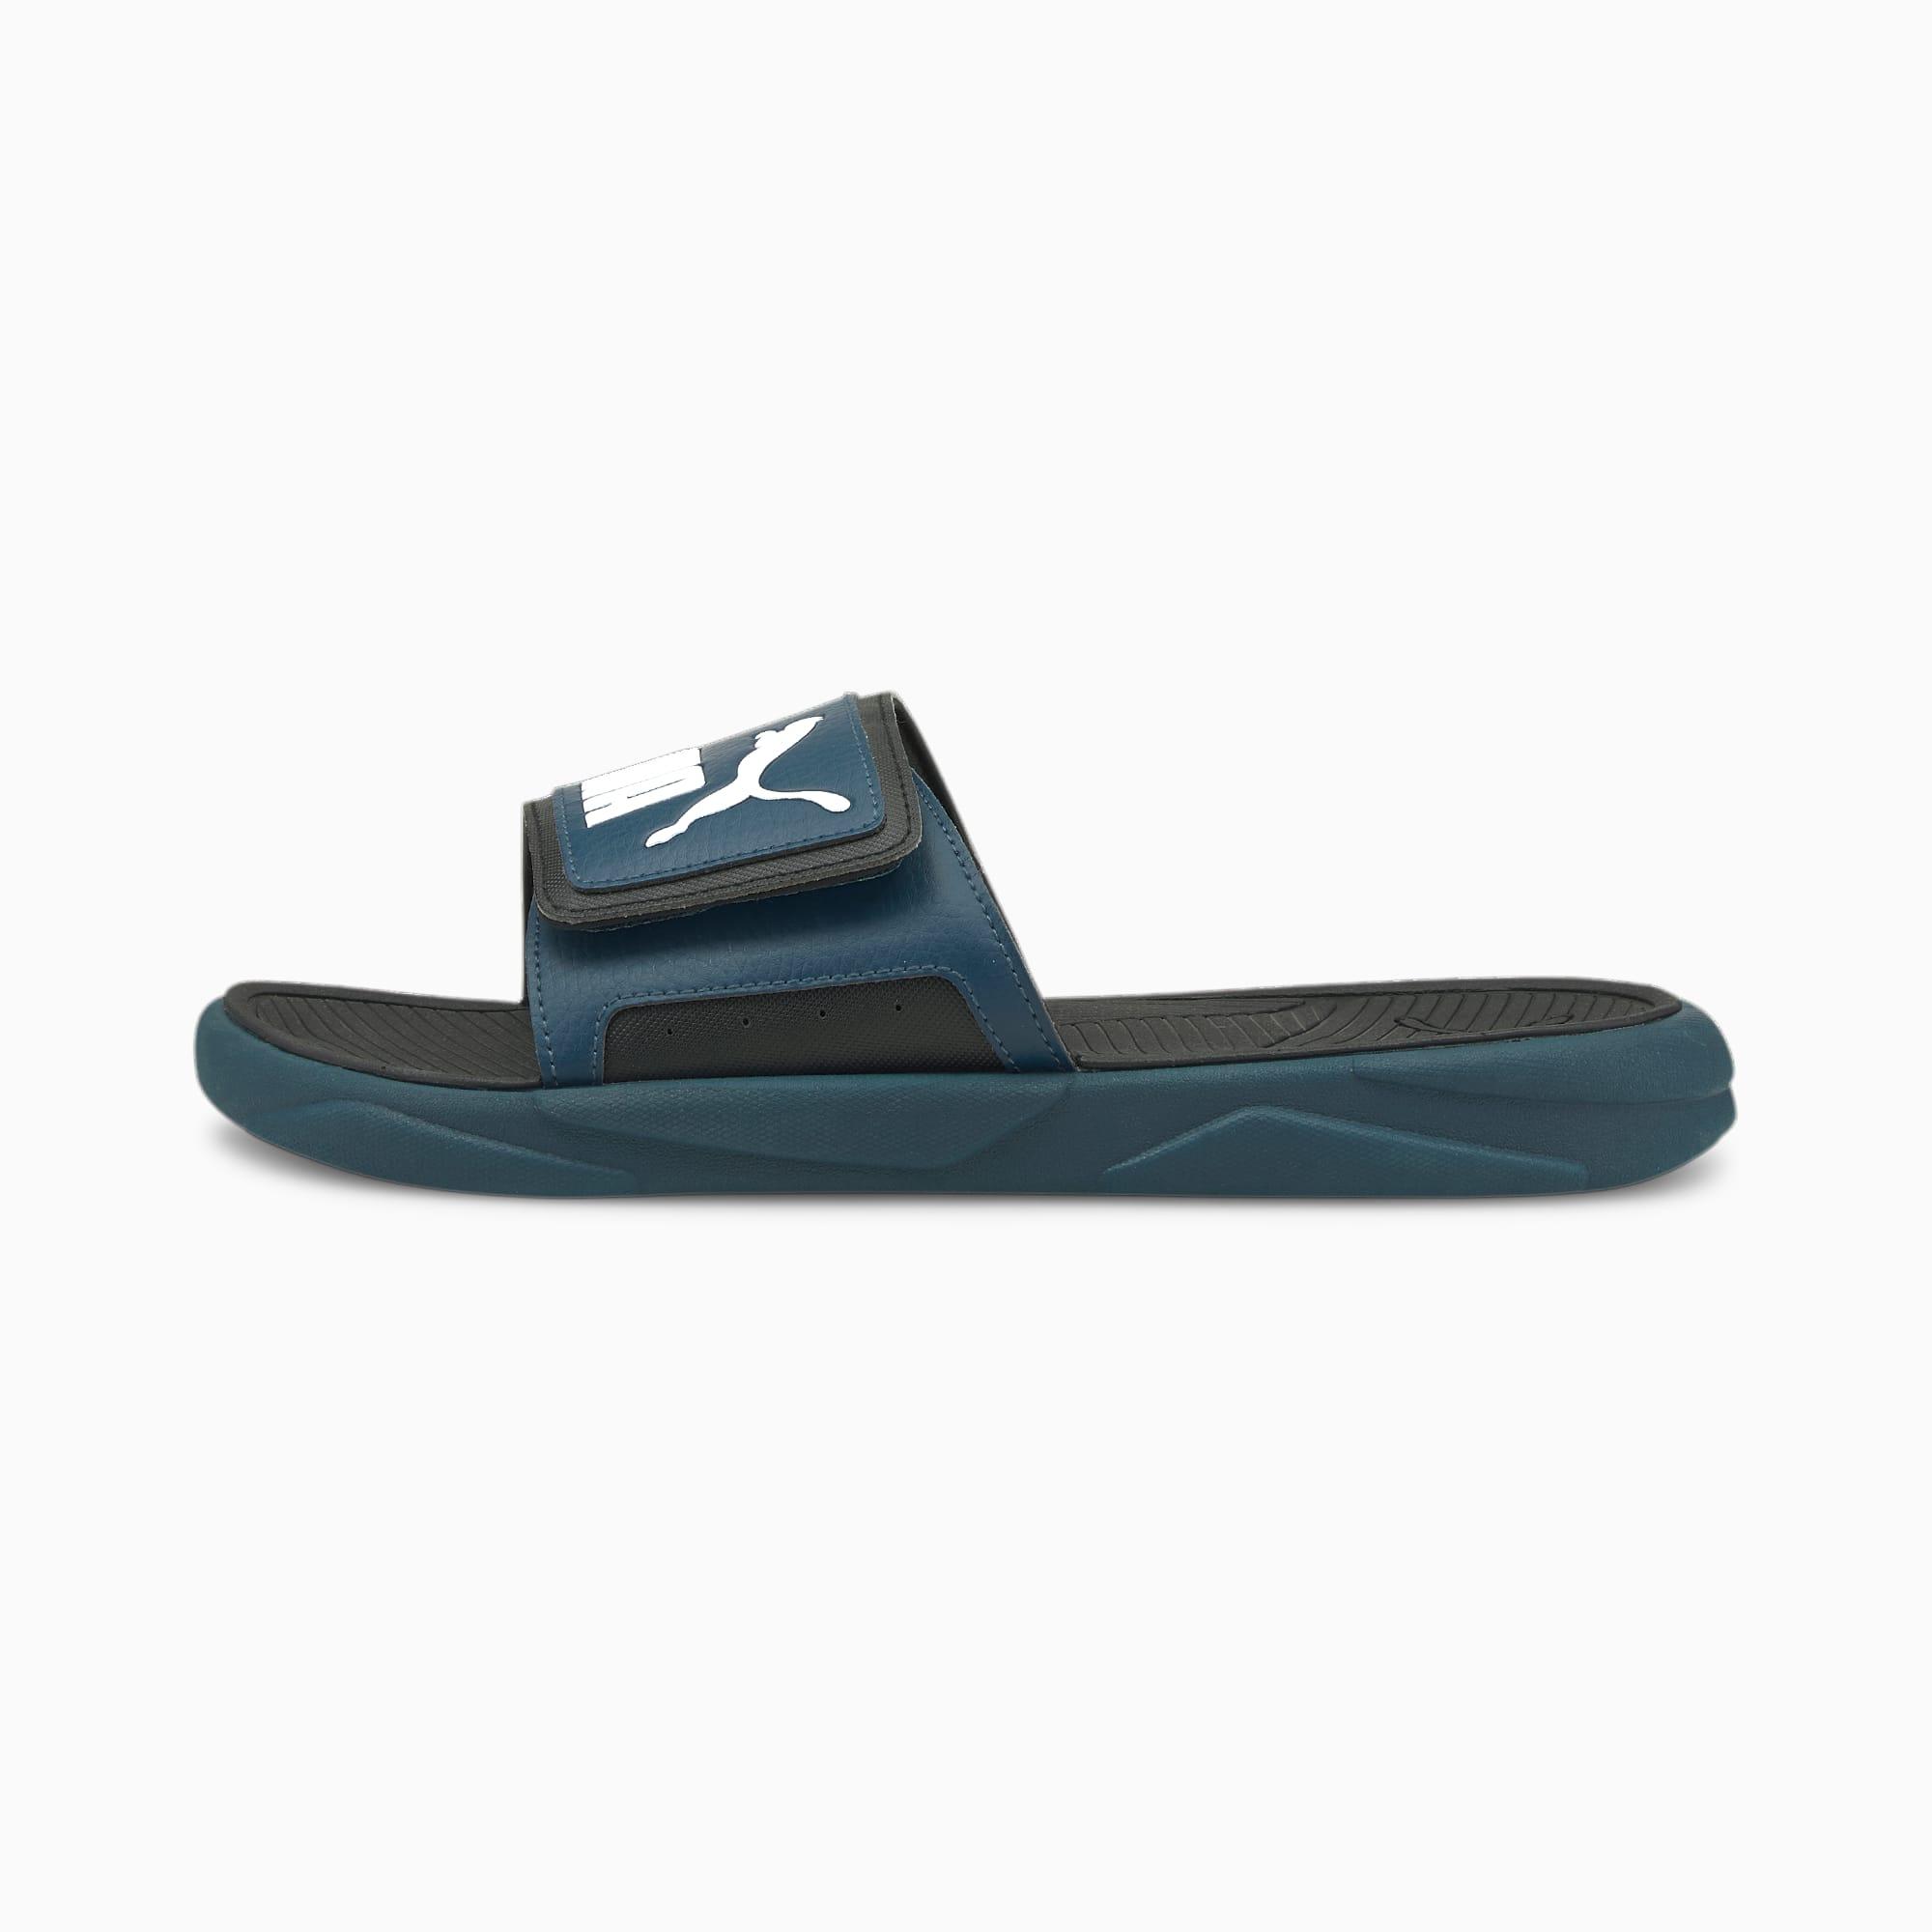 Royalcat Comfort Slides